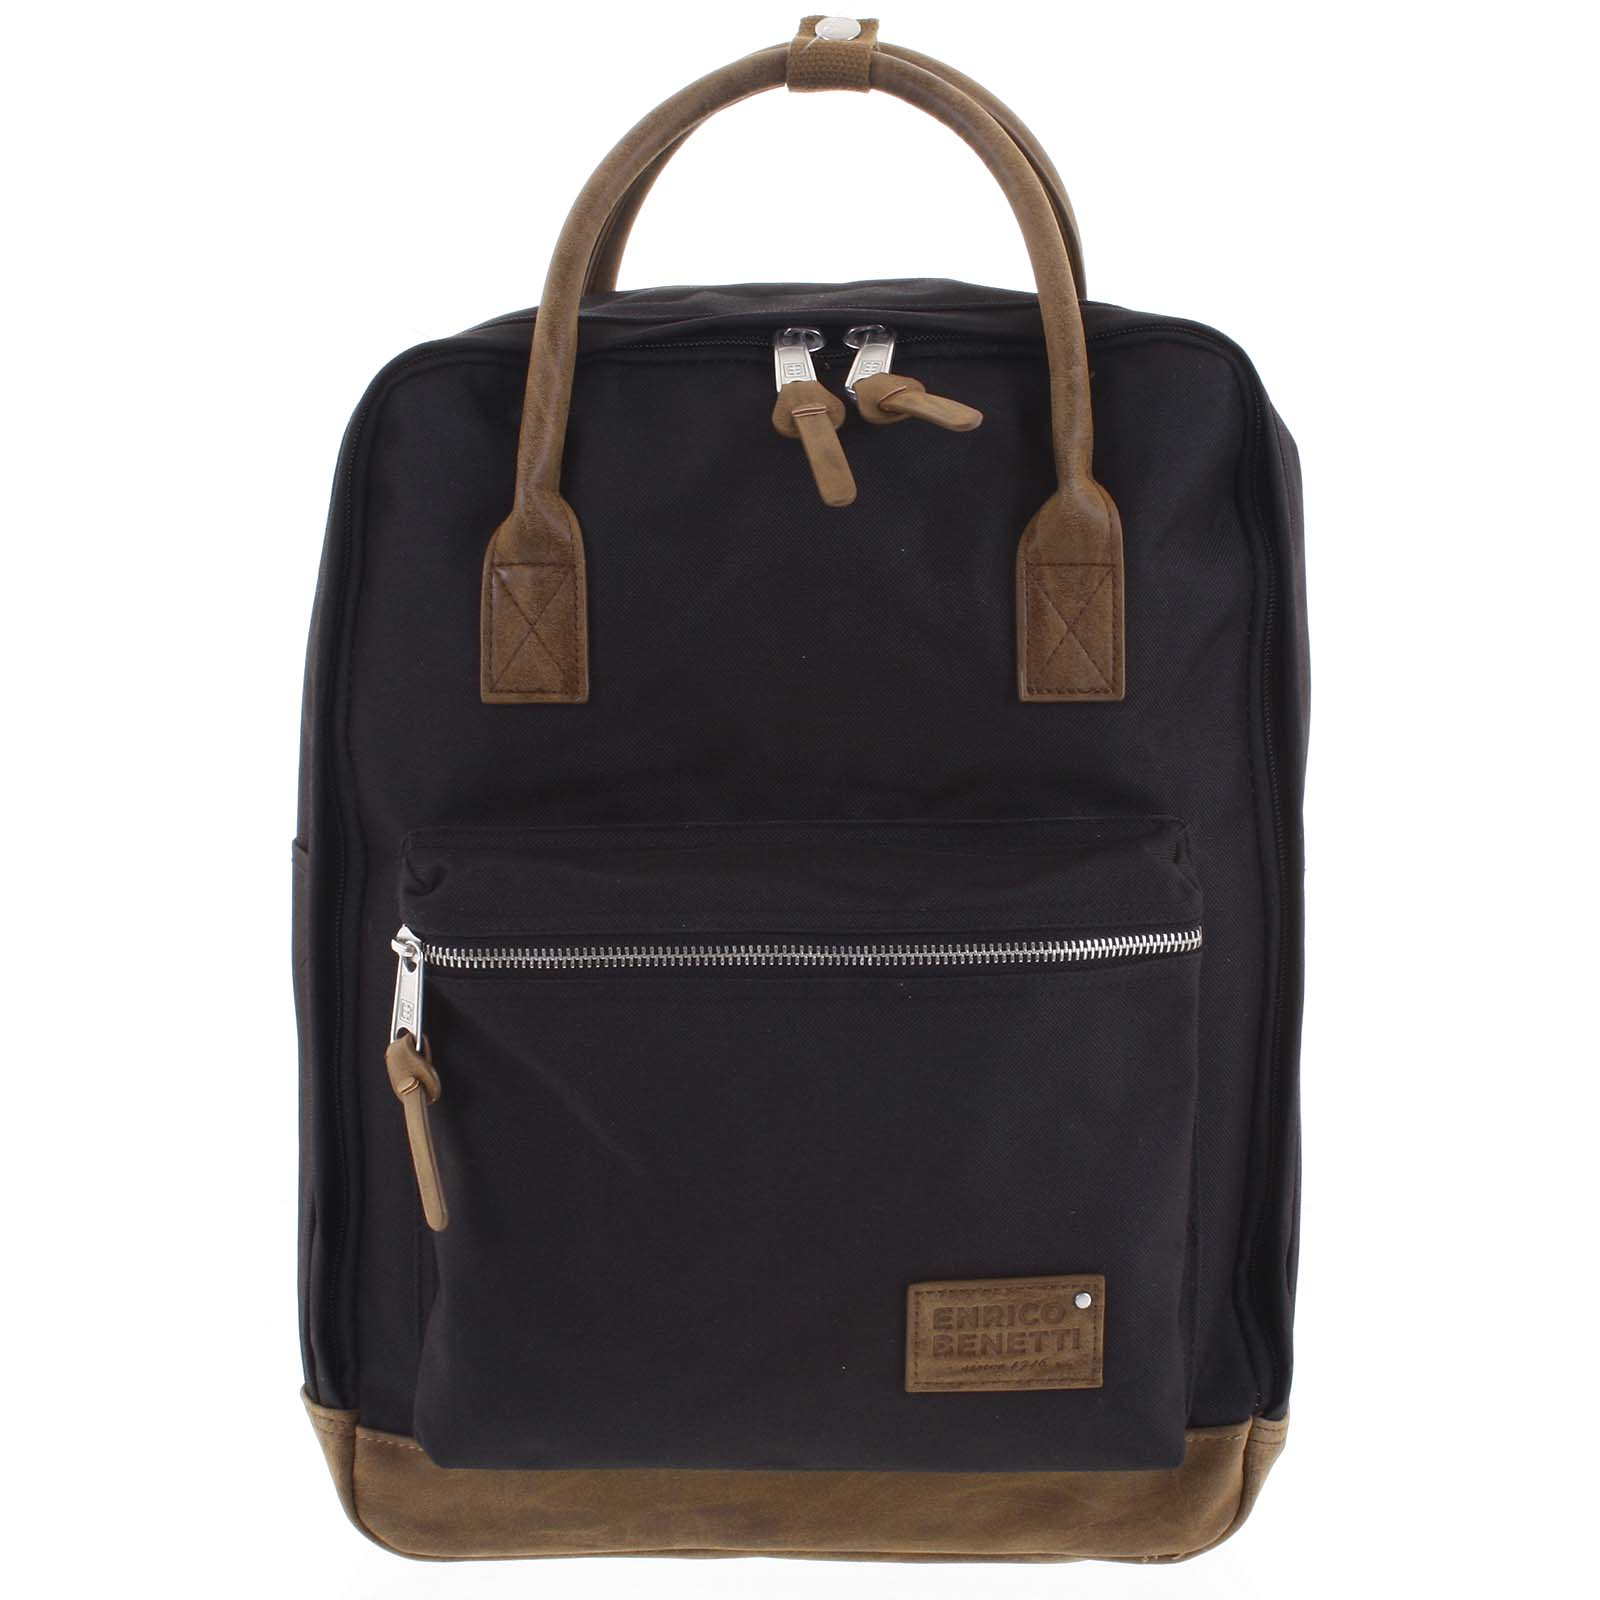 Pánský stylový batoh černý - Enrico Benetti Lefl